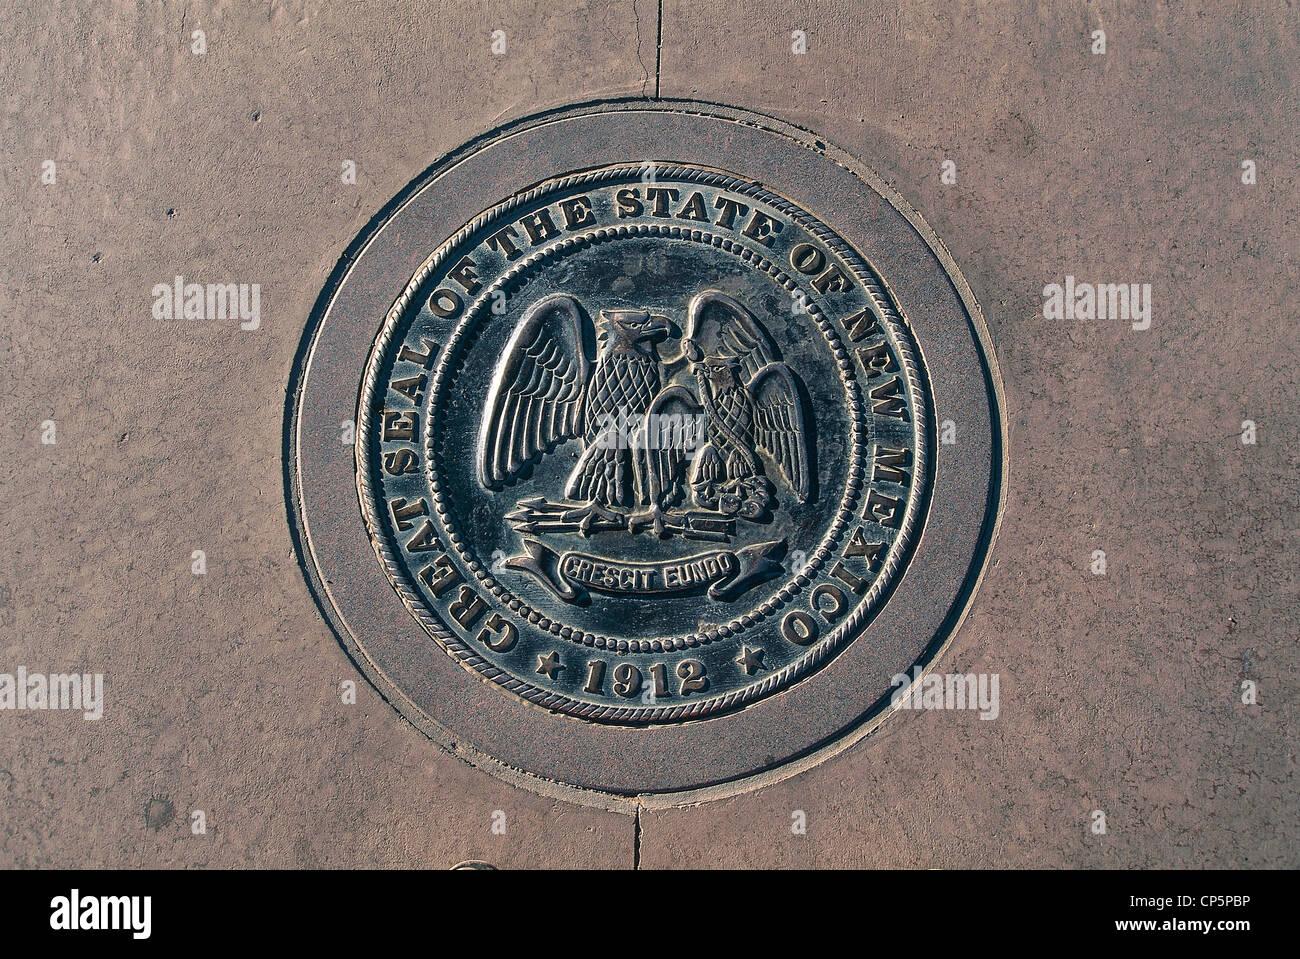 United States of America - Colorado - Four Corners  Coat of